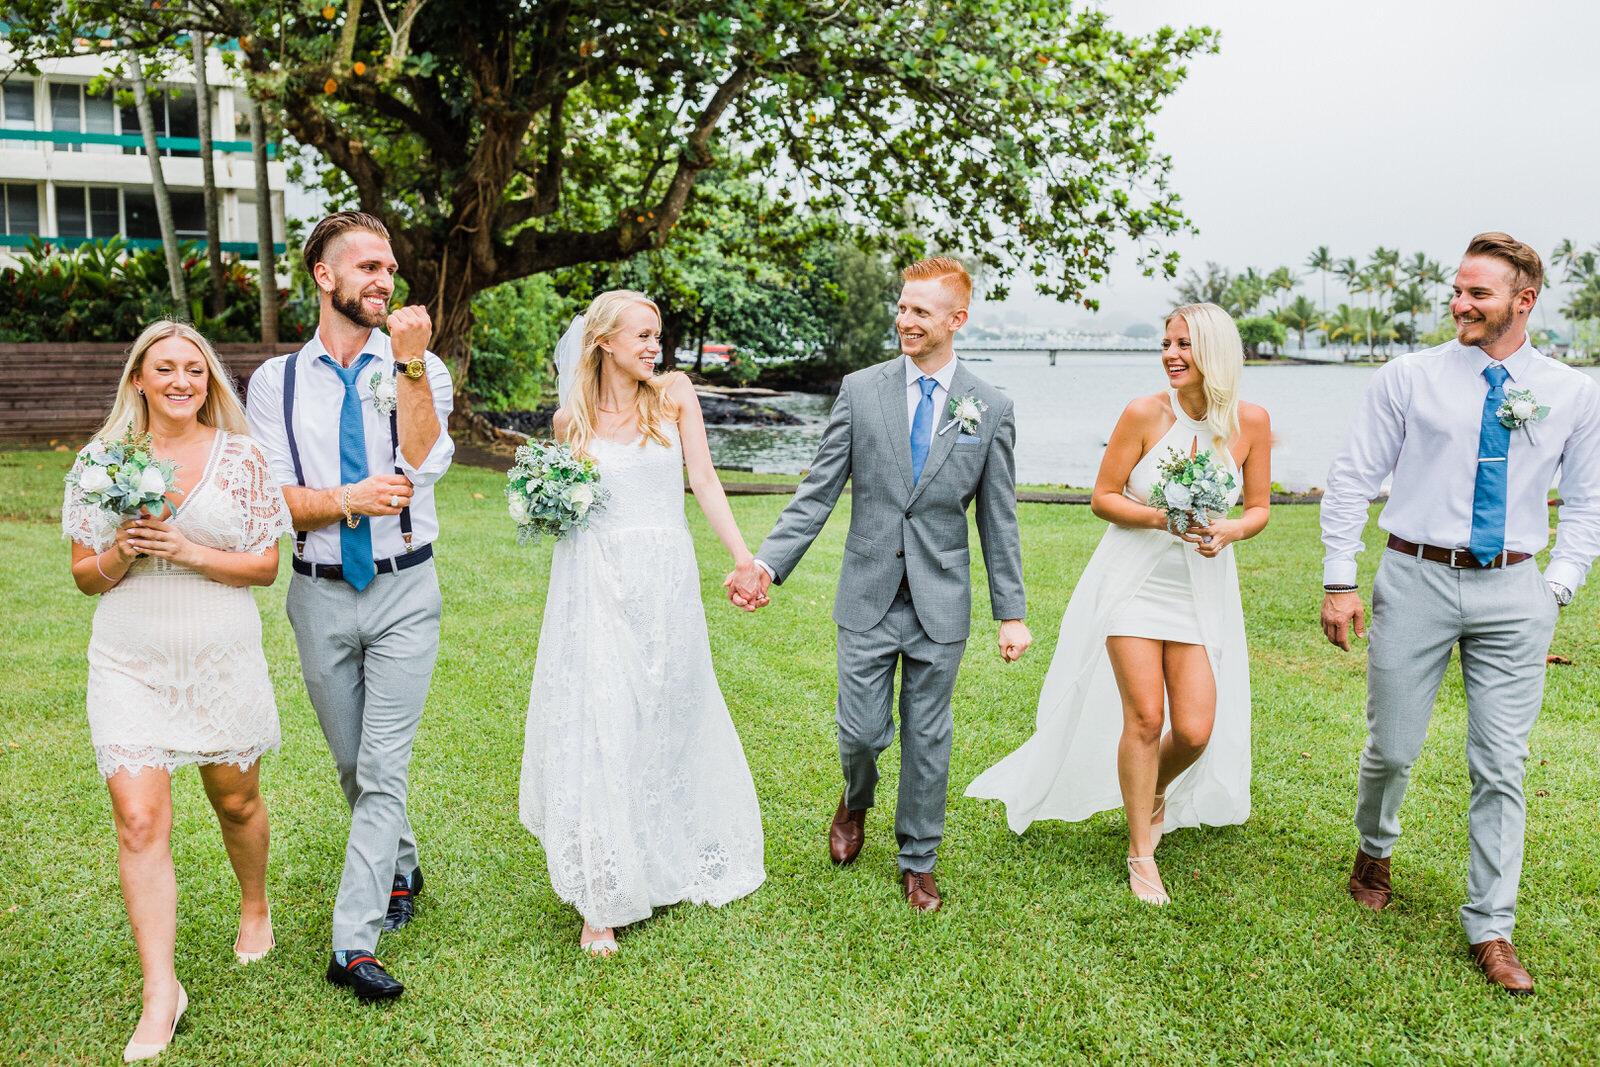 small-wedding-hawaii-destination-hilton-coconut-island-0140.jpg